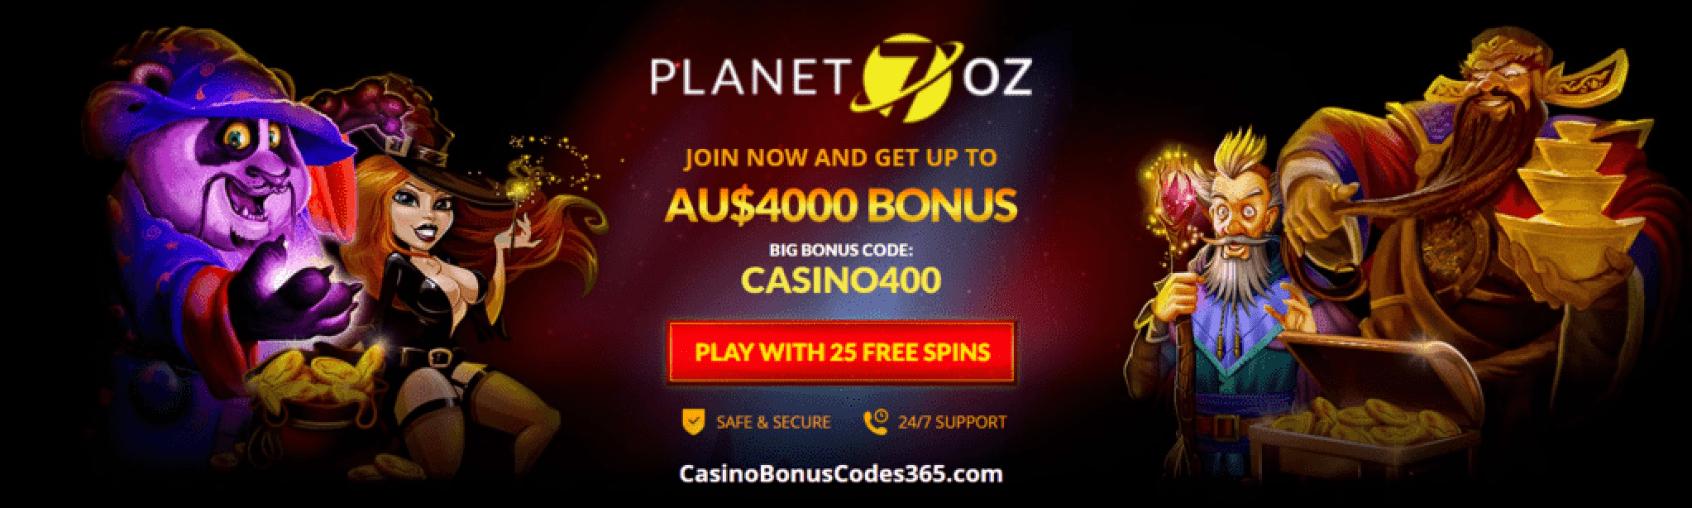 Planet 7 OZ Casino AU$4000 Bonus plus 25 FREE Spins